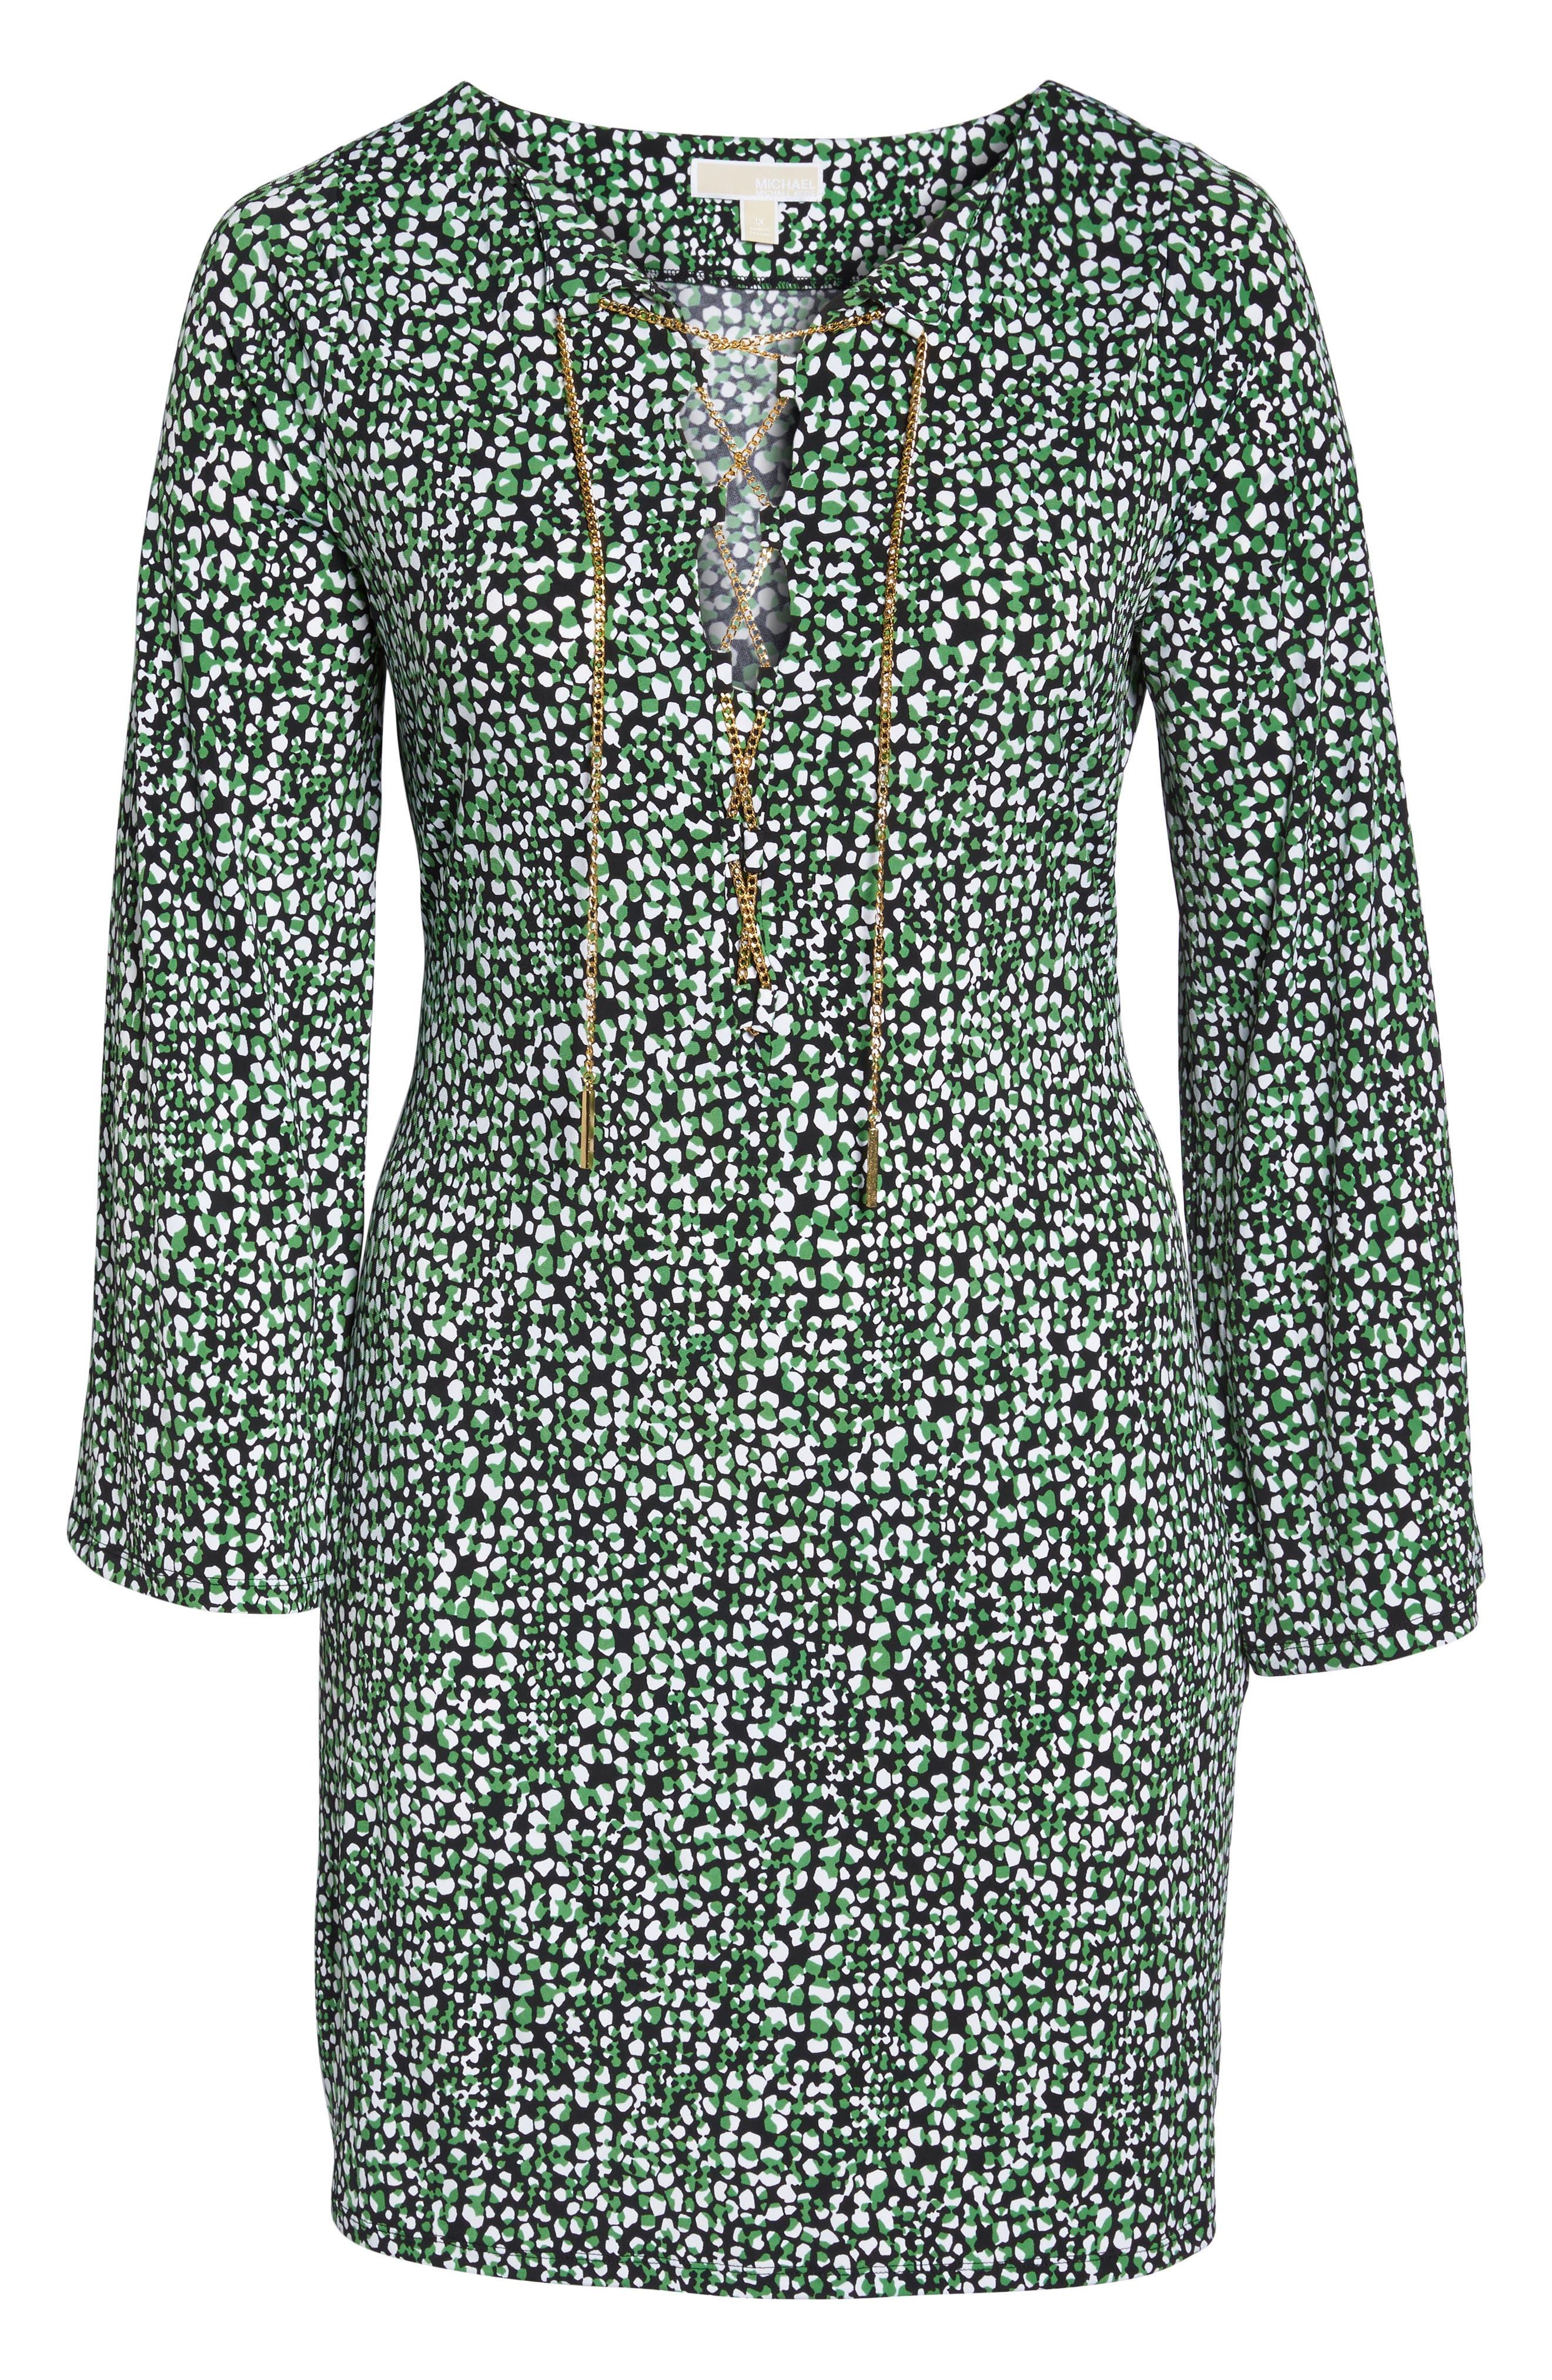 Chain Neck Print Shift Dress,                             Alternate thumbnail 6, color,                             369